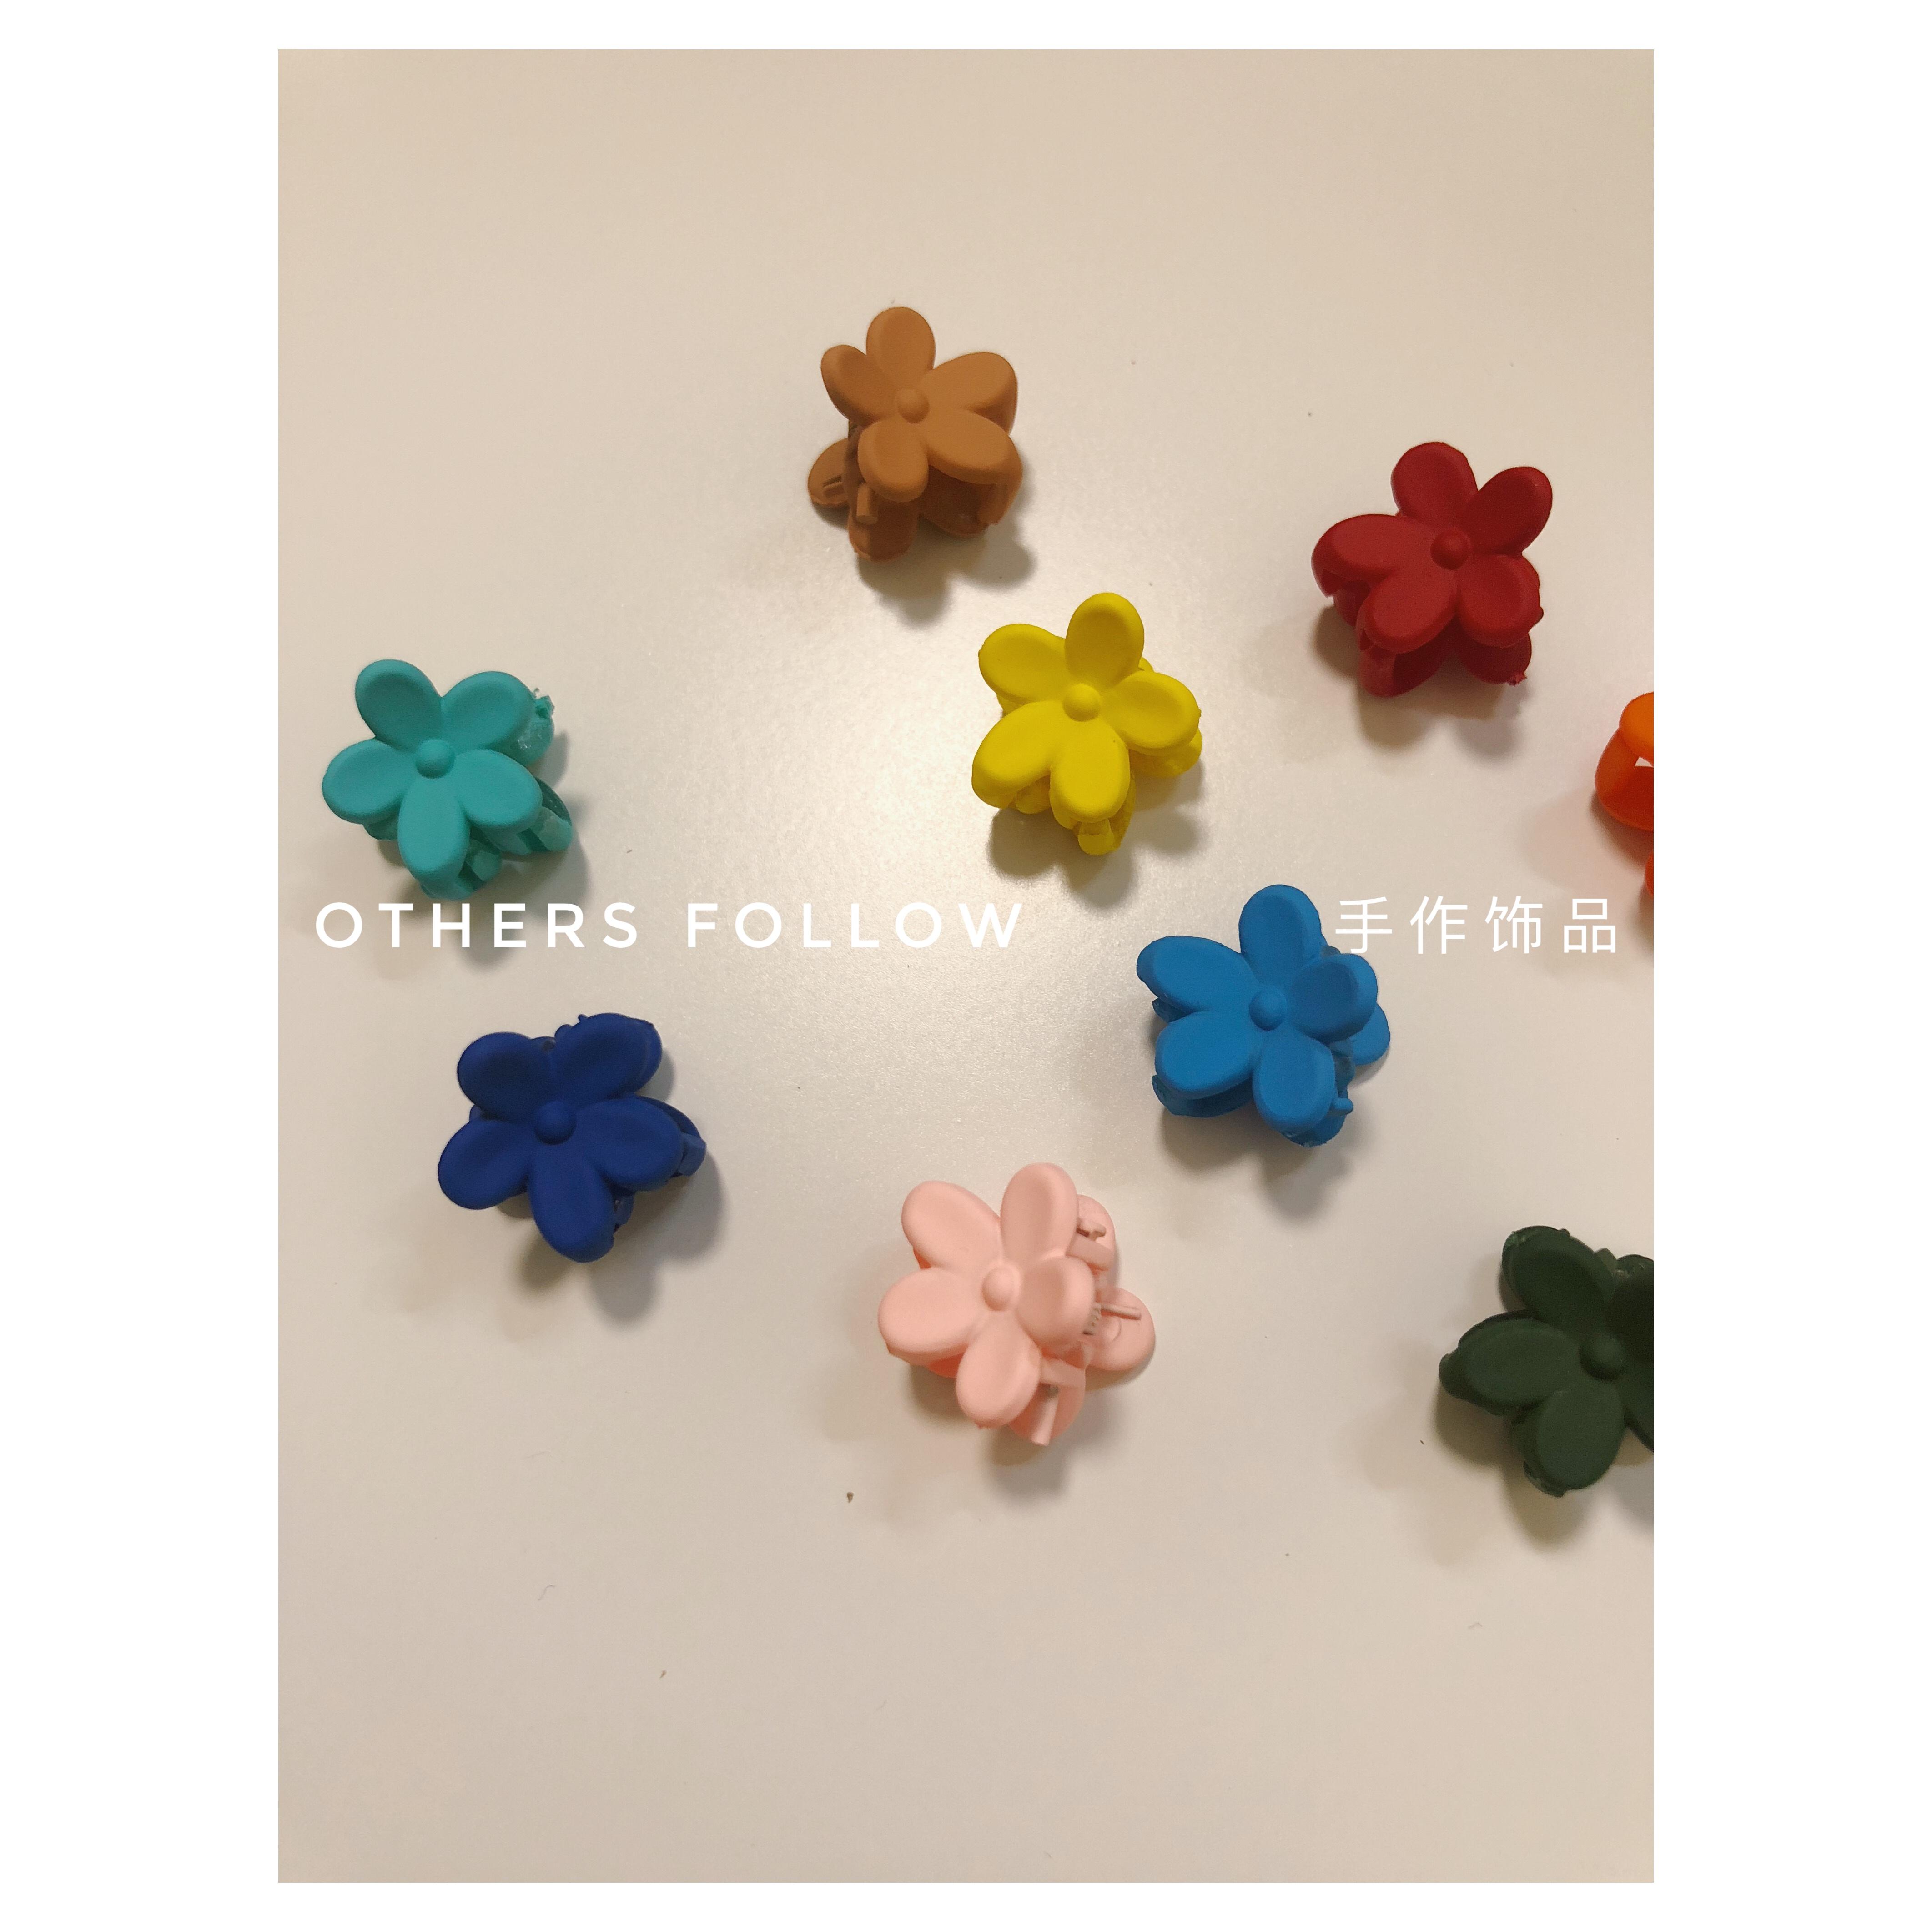 【follow】泫雅小花娜娜同款彩色抓夹10-16新券